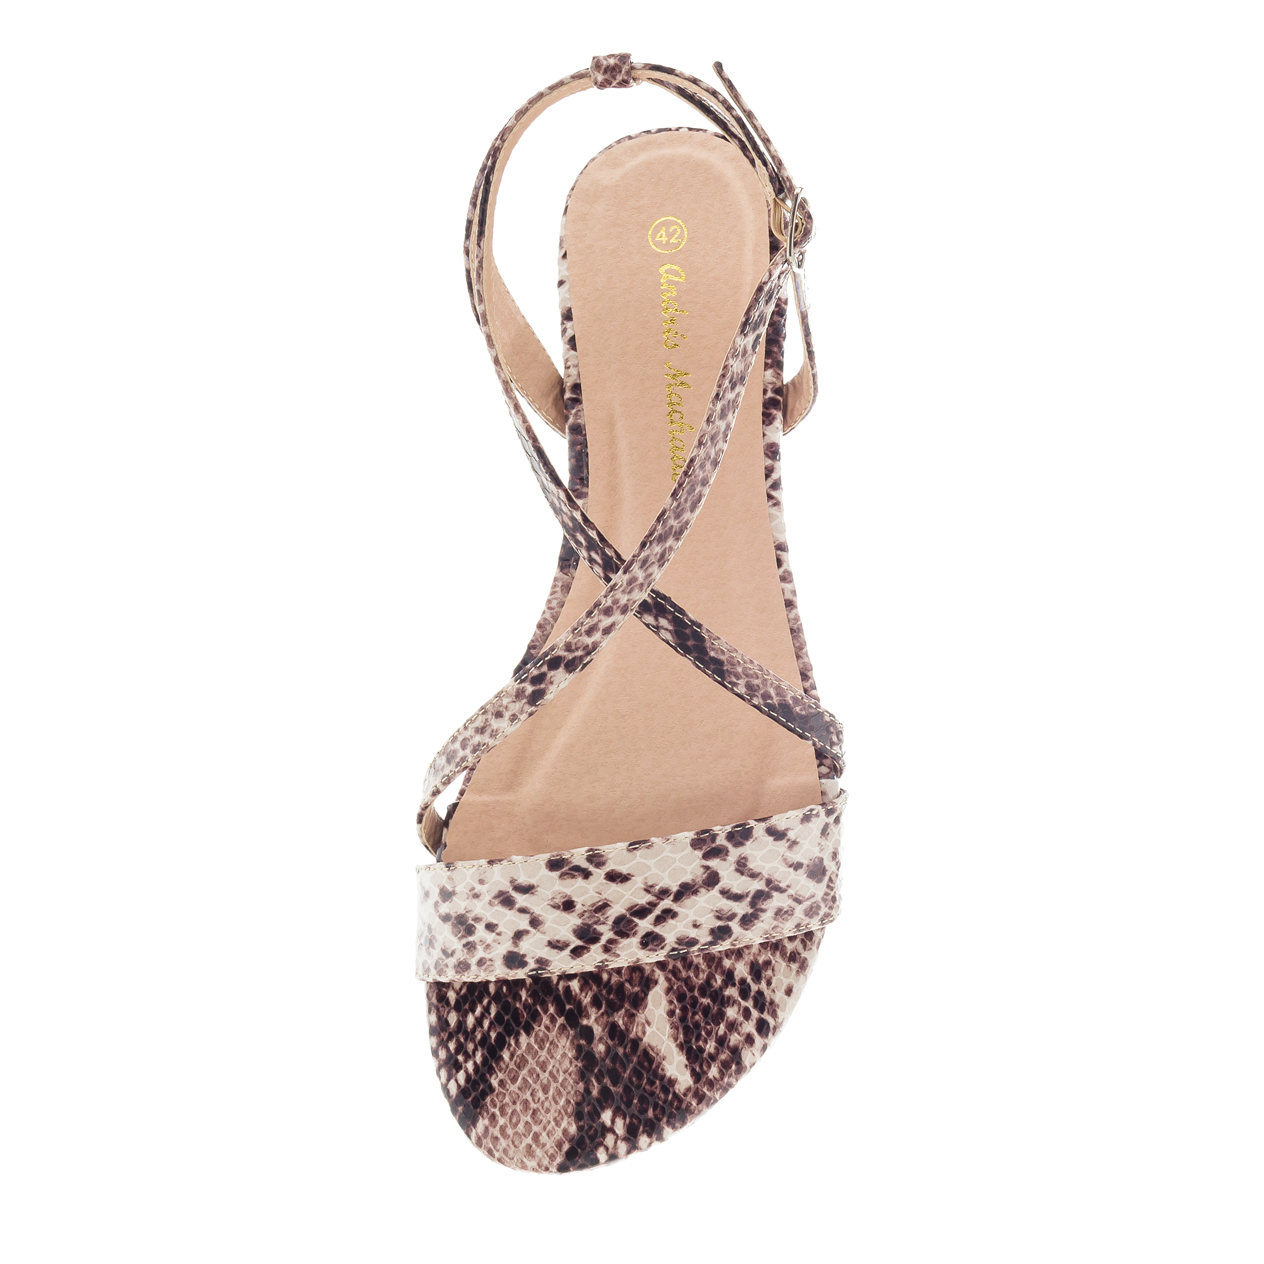 Ruskeat käärmeprintti sandaalit.